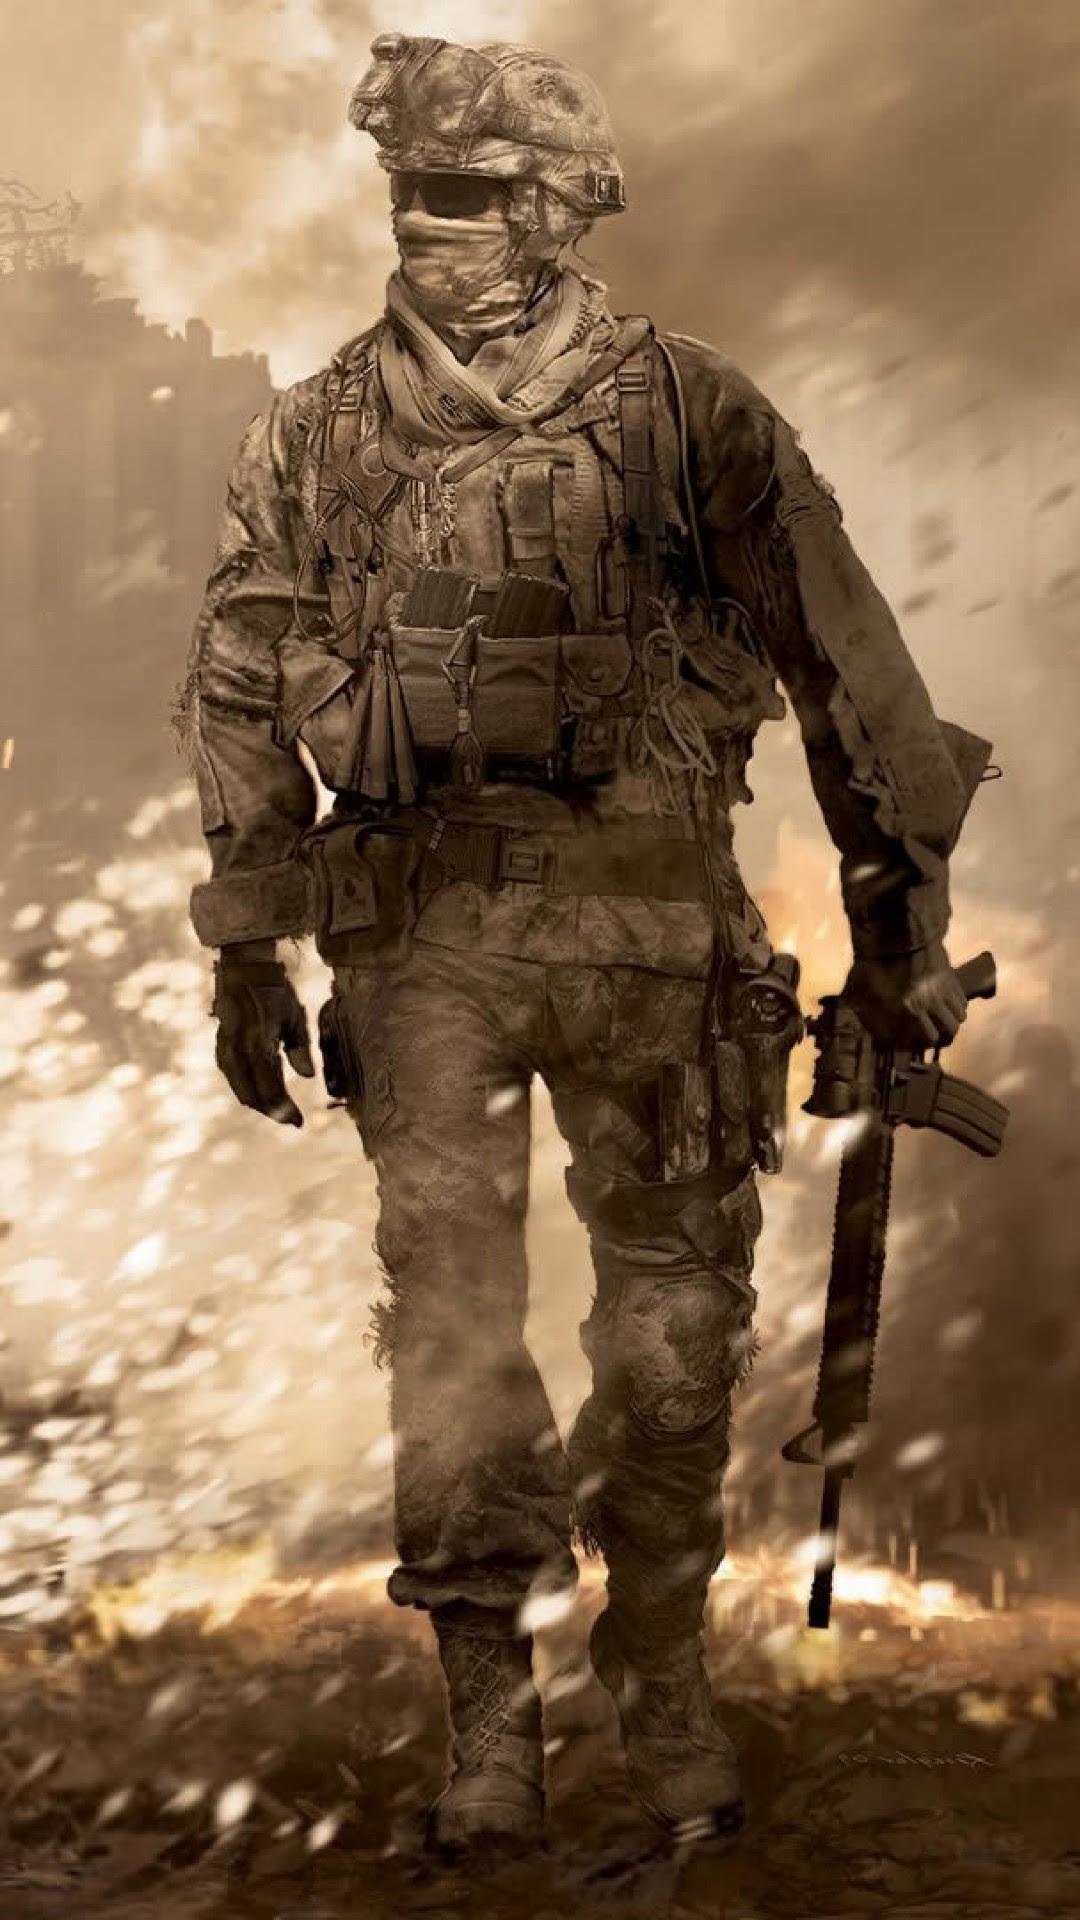 Call Of Duty Modern Warfare 2 Wallpaper For Desktop And Mobiles